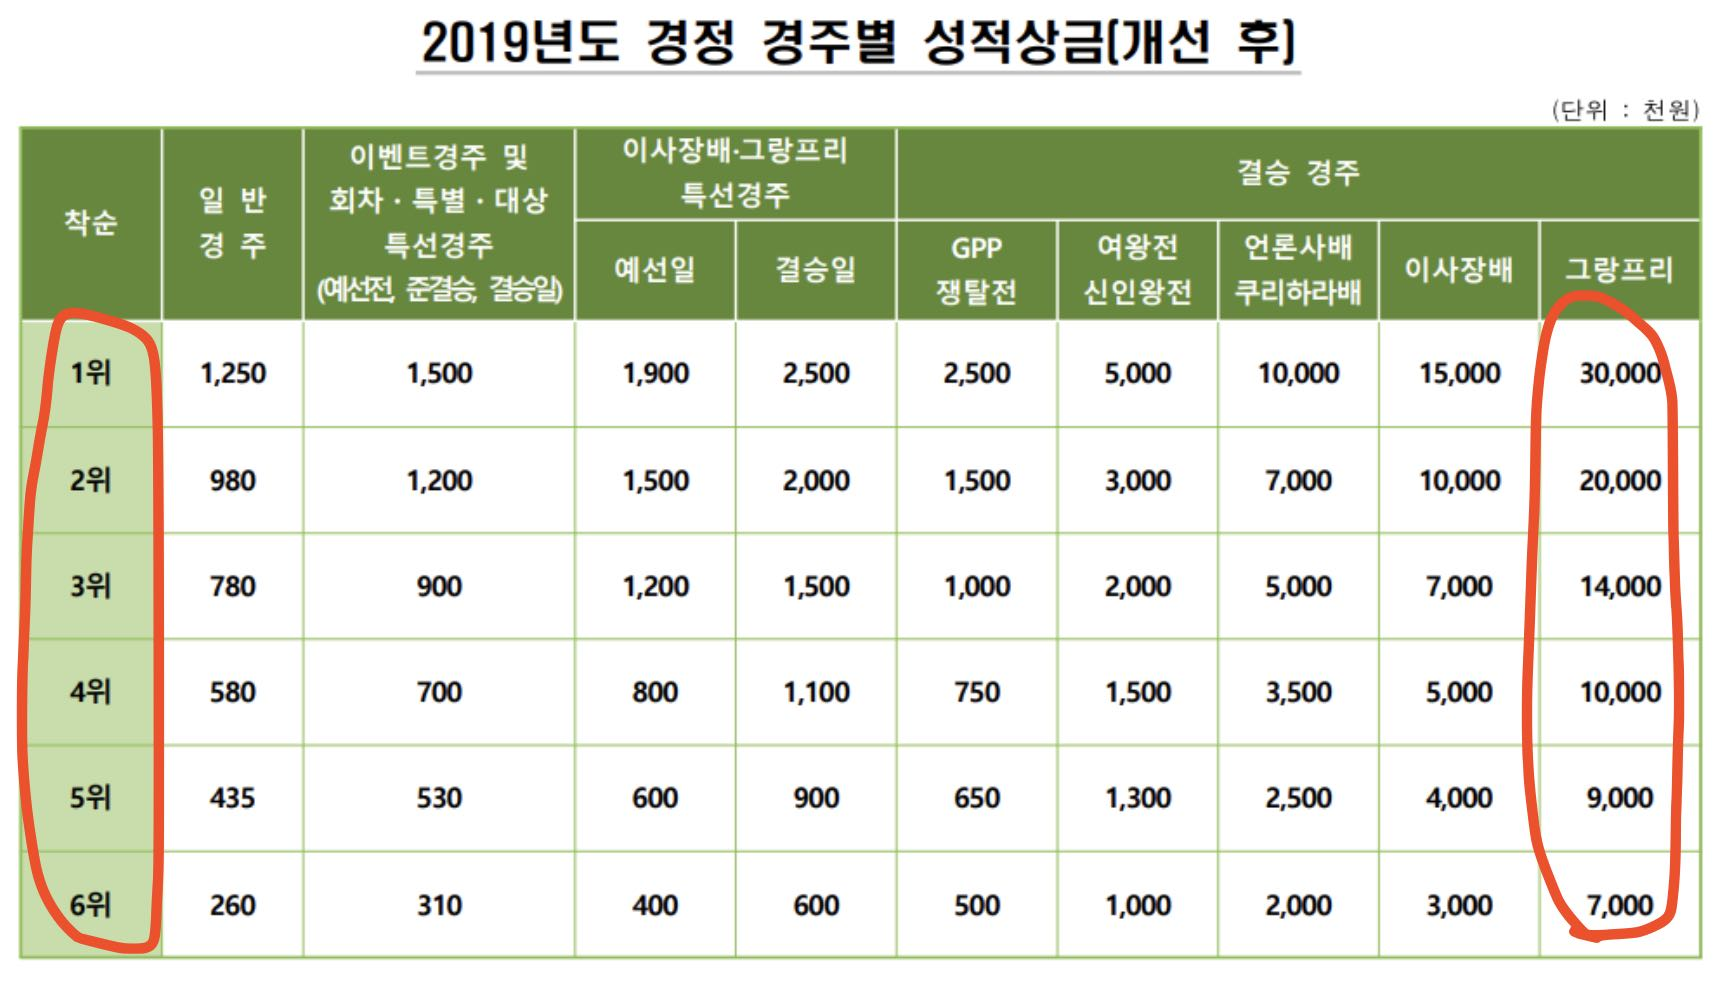 韓国競艇の2019年度補正レース別成績賞金表